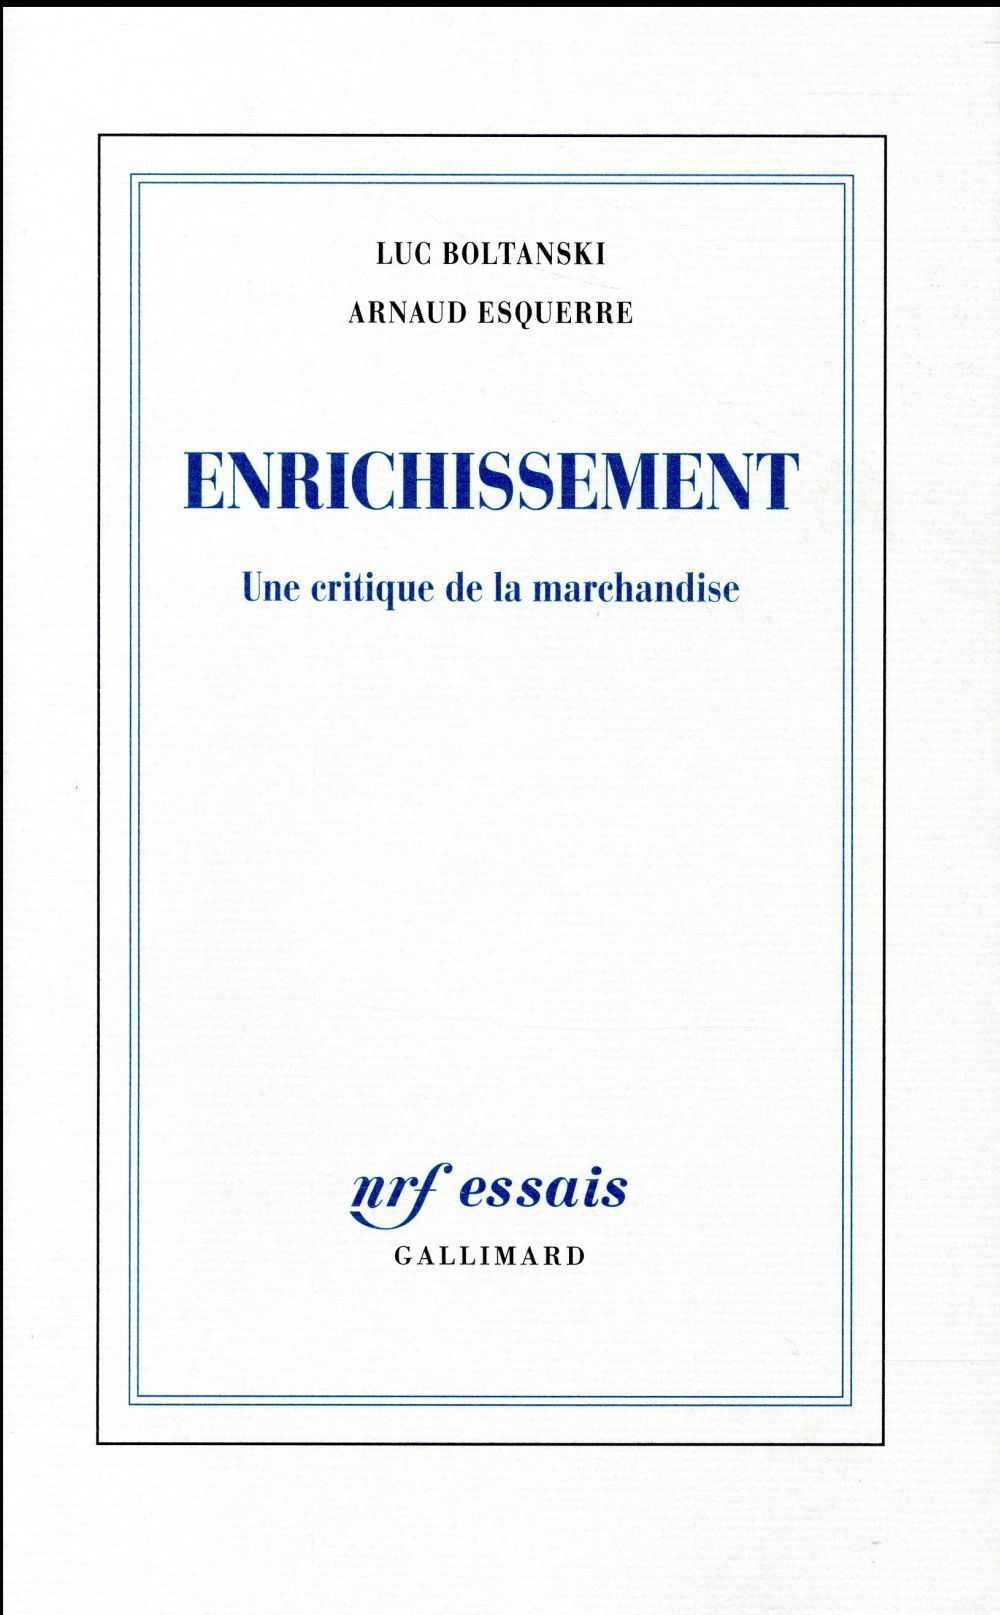 ENRICHISSEMENT